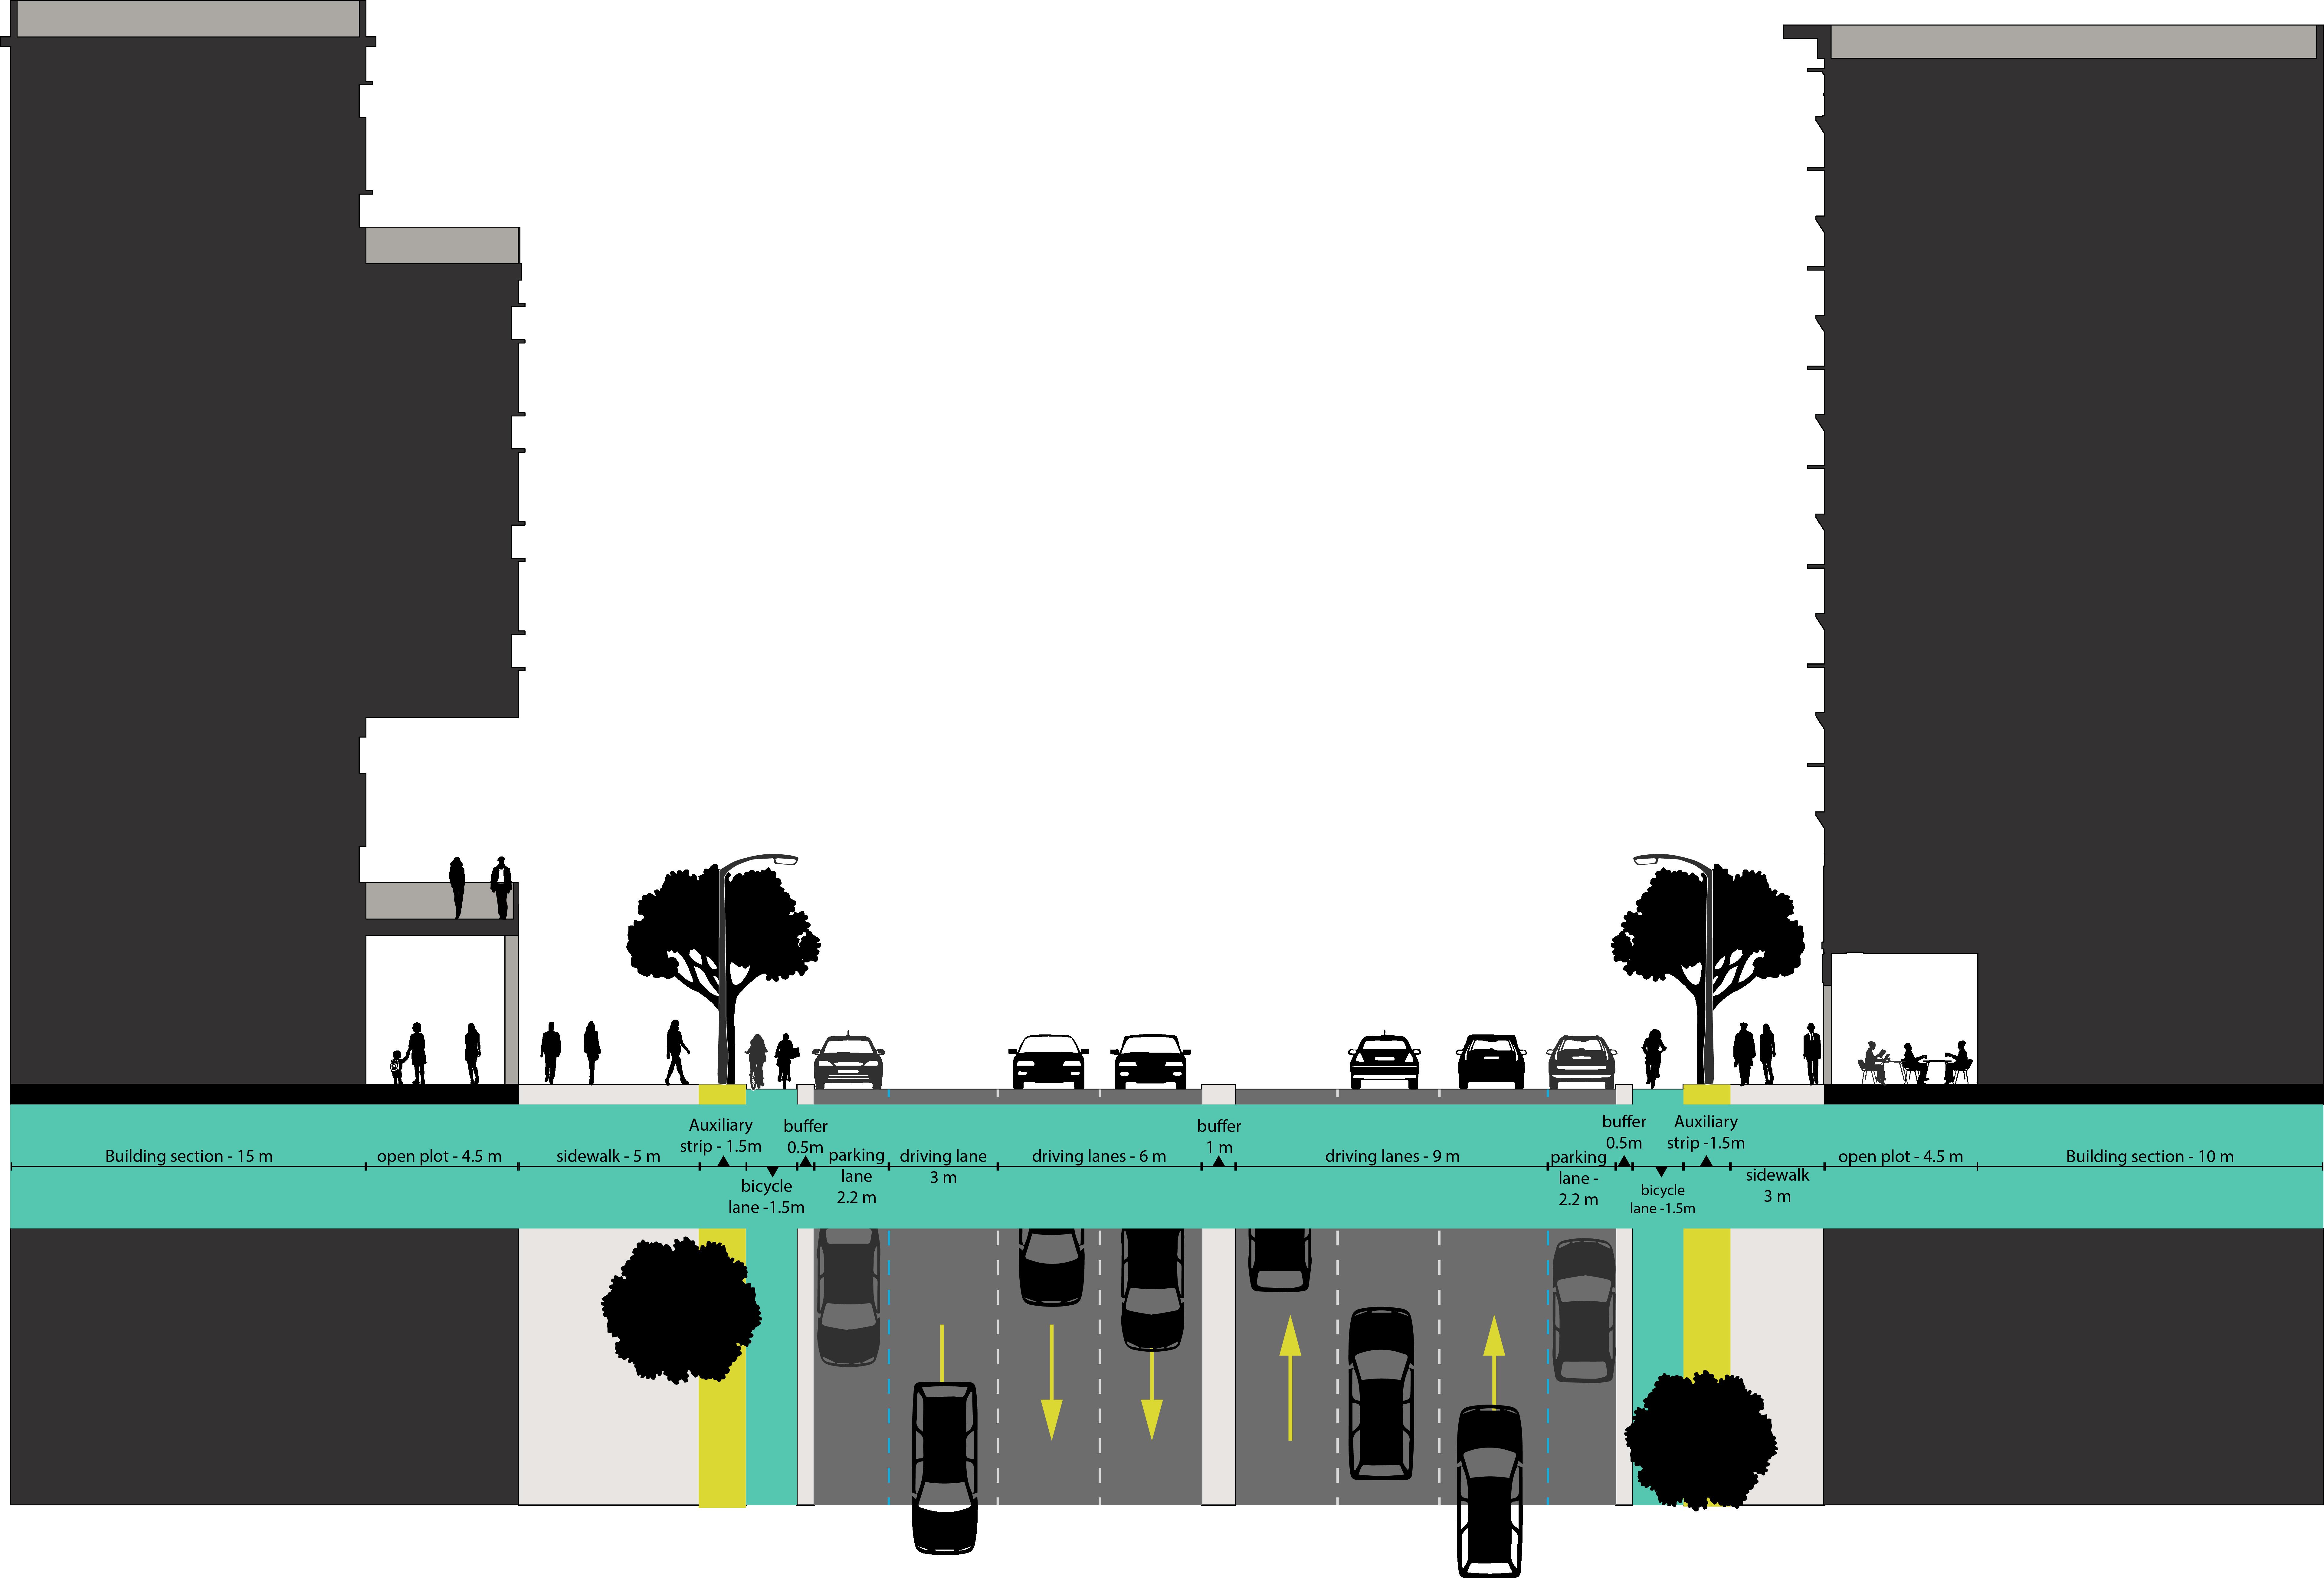 36 m. width street section